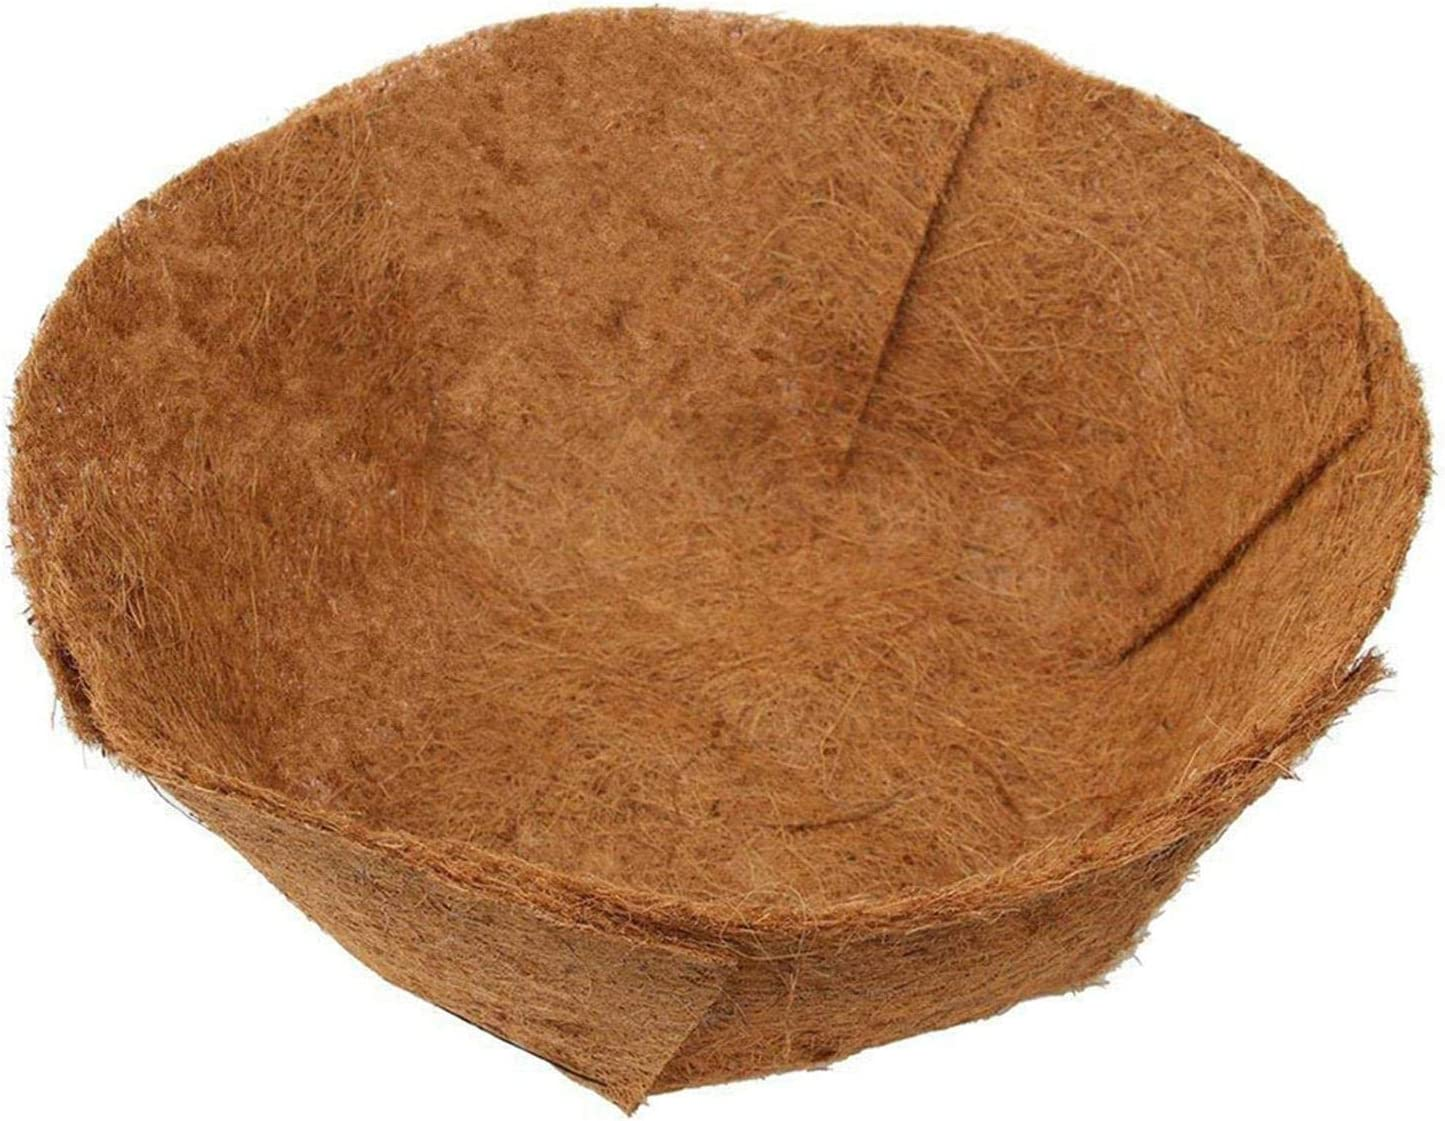 EROCK 2PCS Round Replacement Coco Liner for Hanging Basket, 24 Inch Coconut Fiber Plant Basket Liner for Garden Planter Flower Pot (Round)